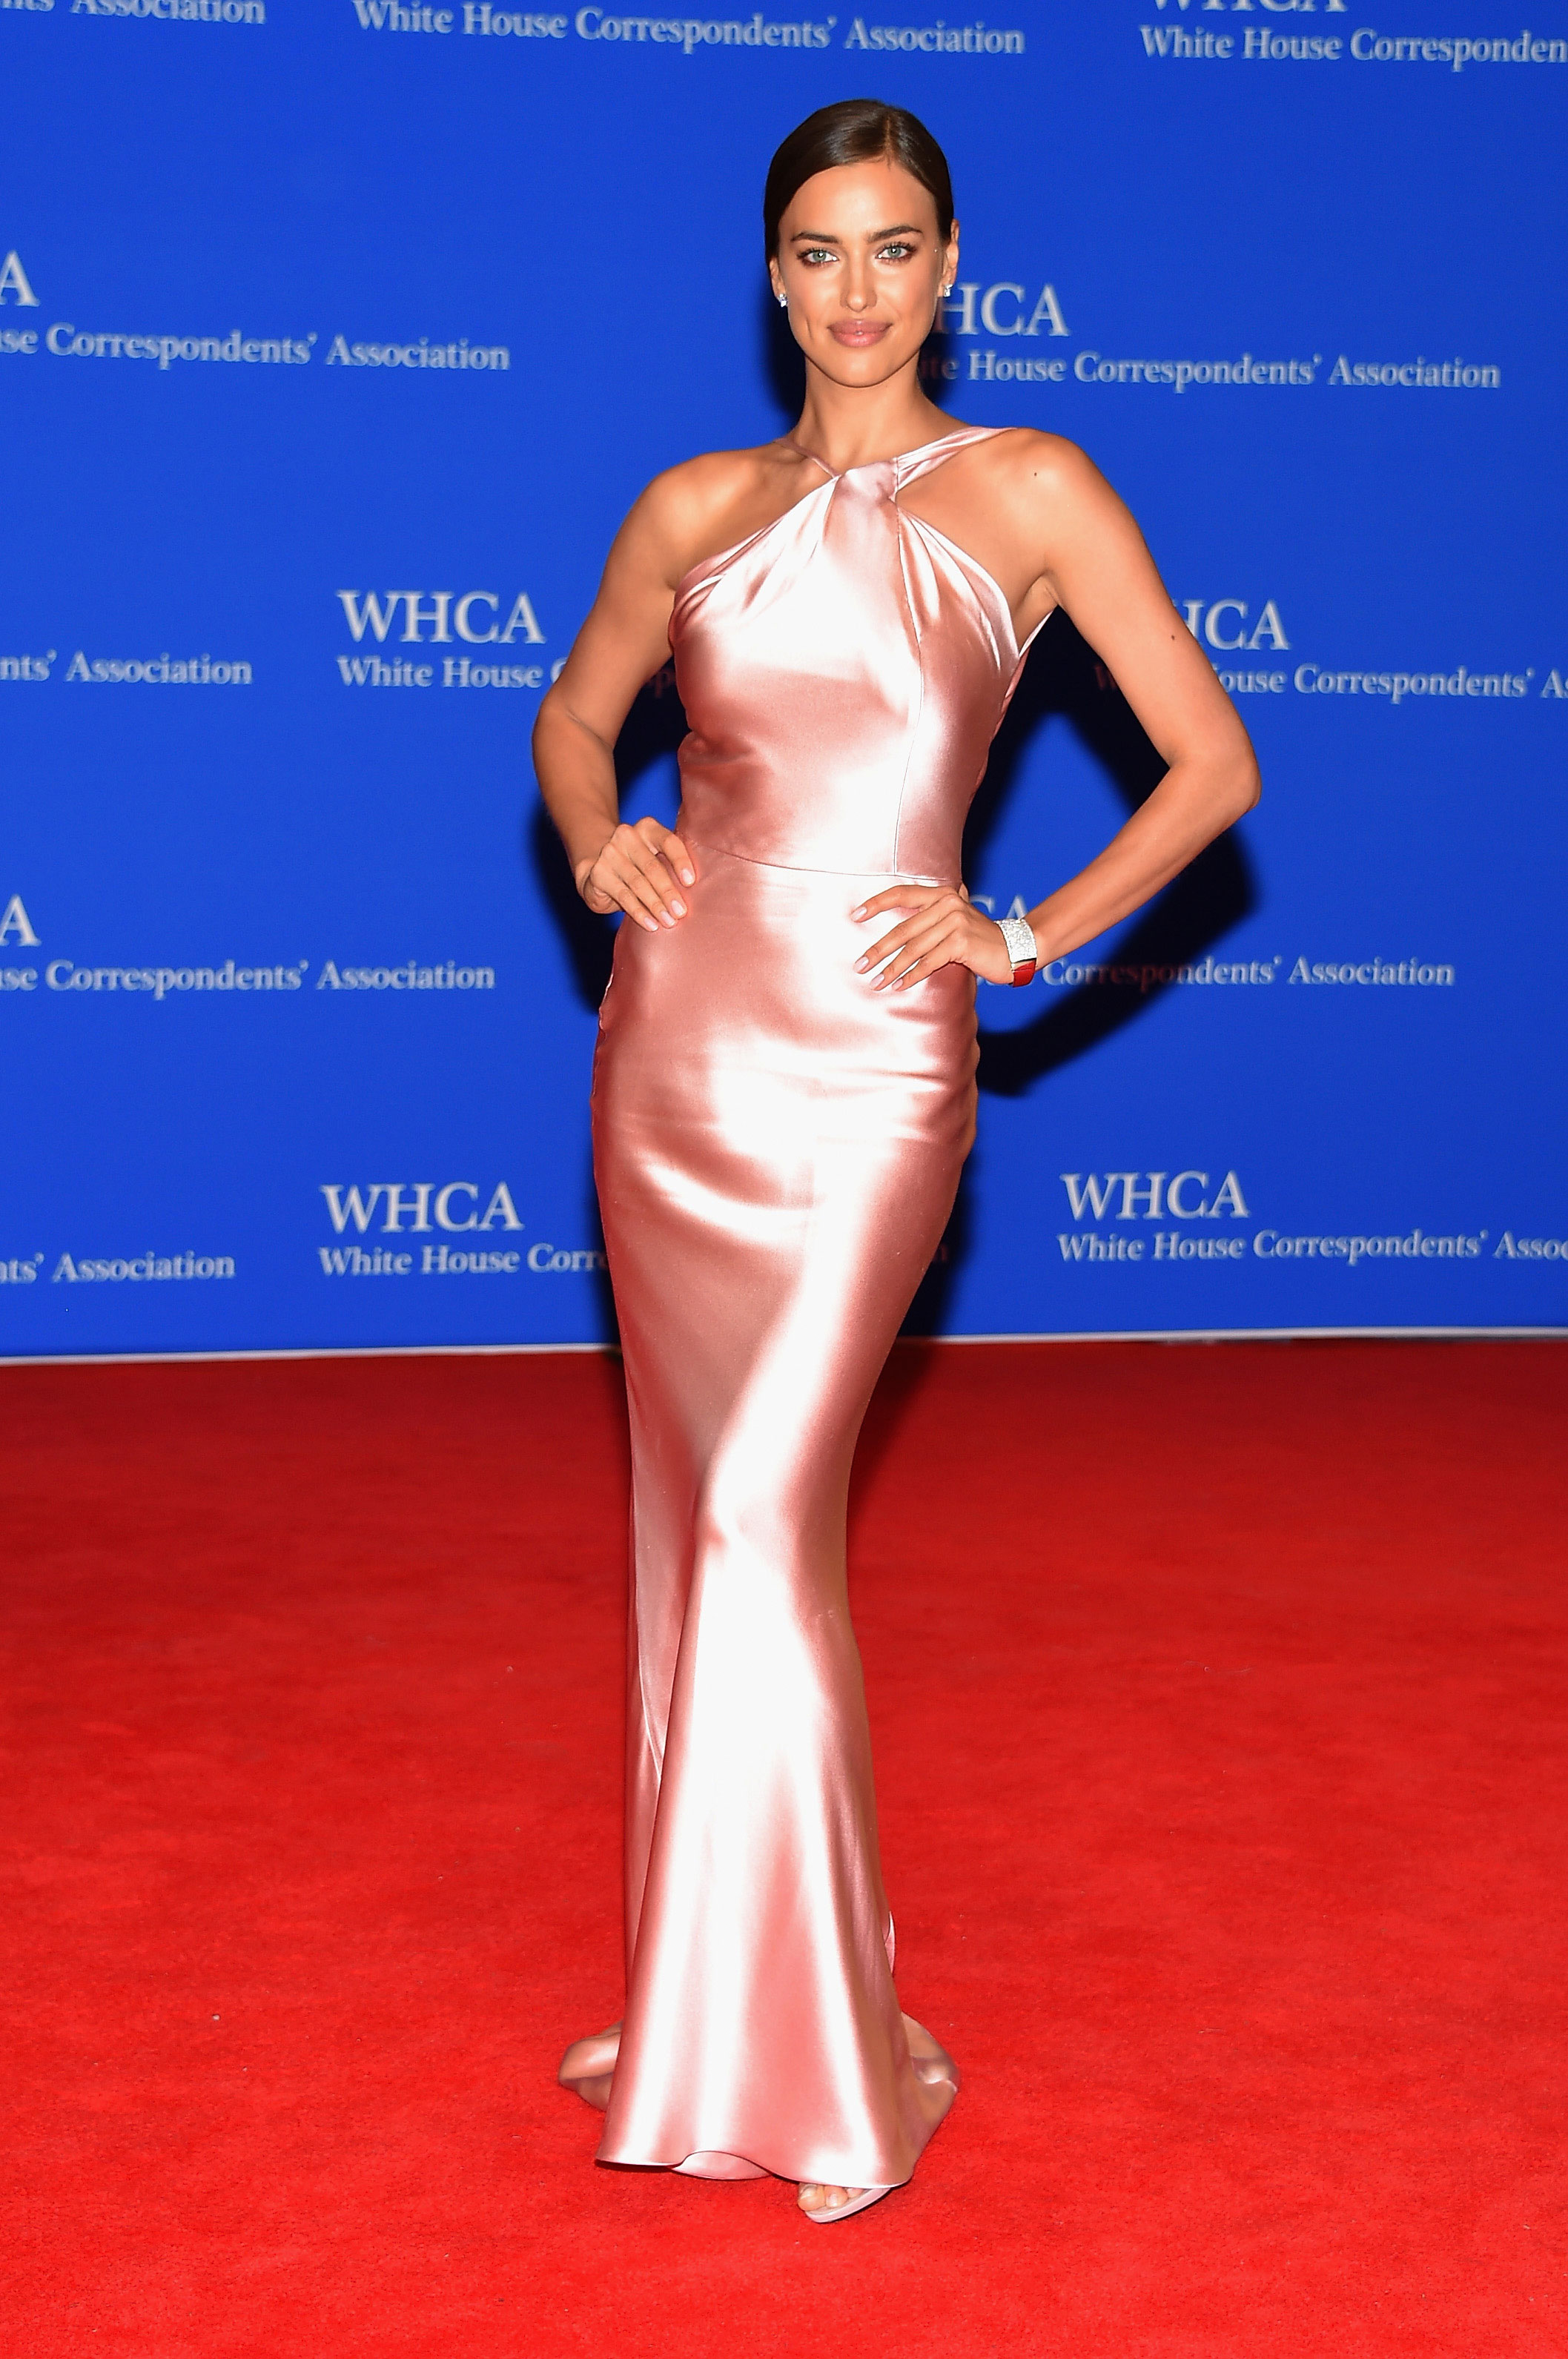 Irina Shayk attends the 101st Annual White House Correspondents' Association Dinner.